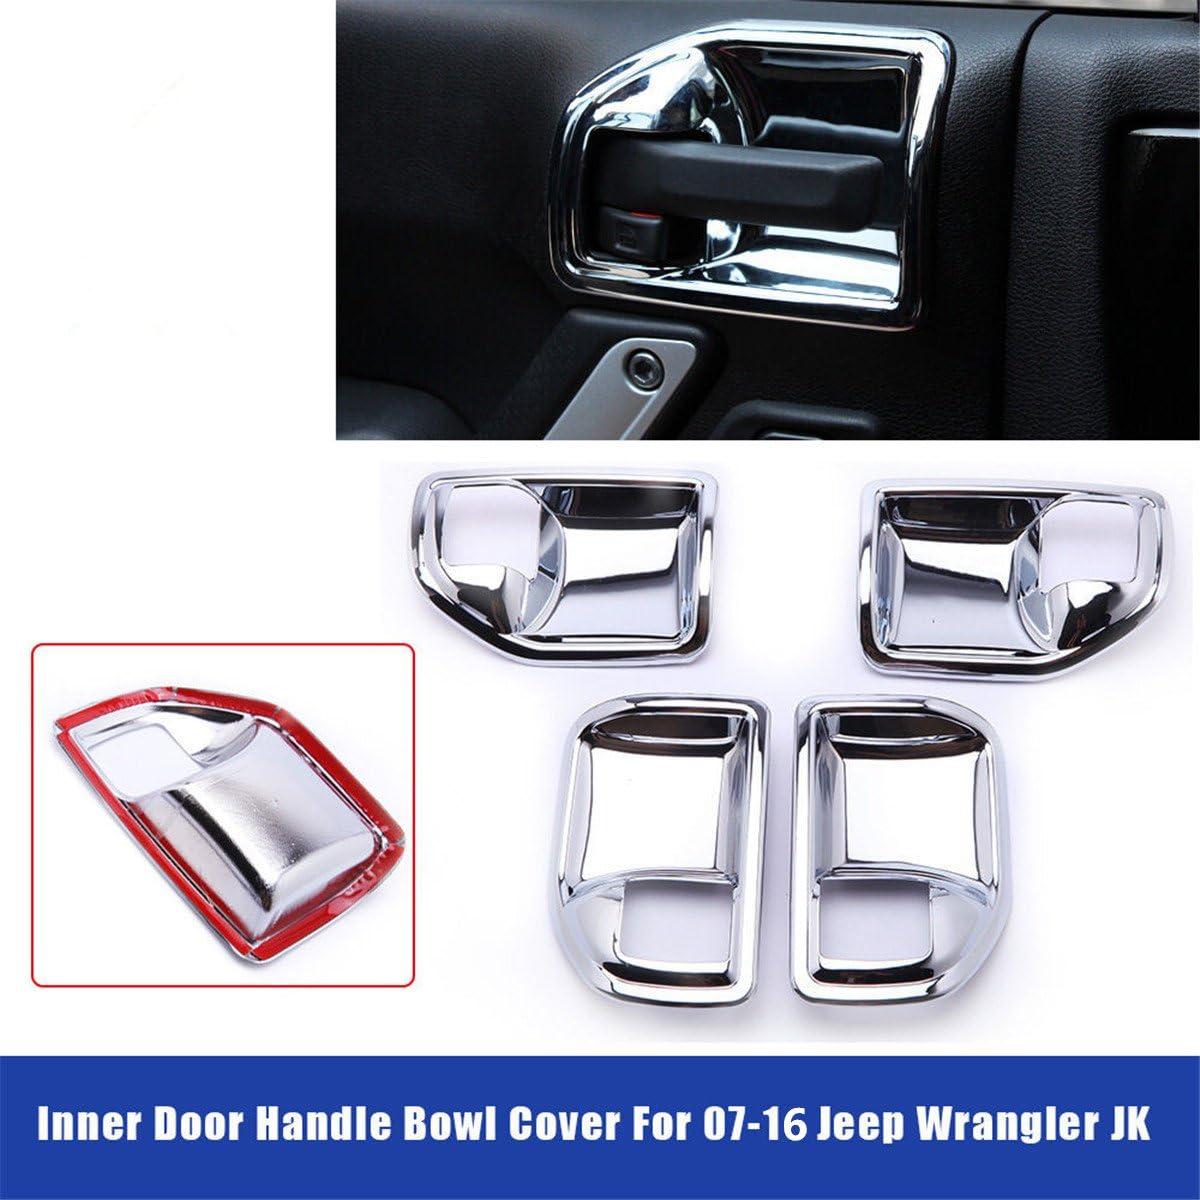 4PC Inside Chrome Door Handle Cover frame Trim For jeep Wrangler 4door 2011-2017